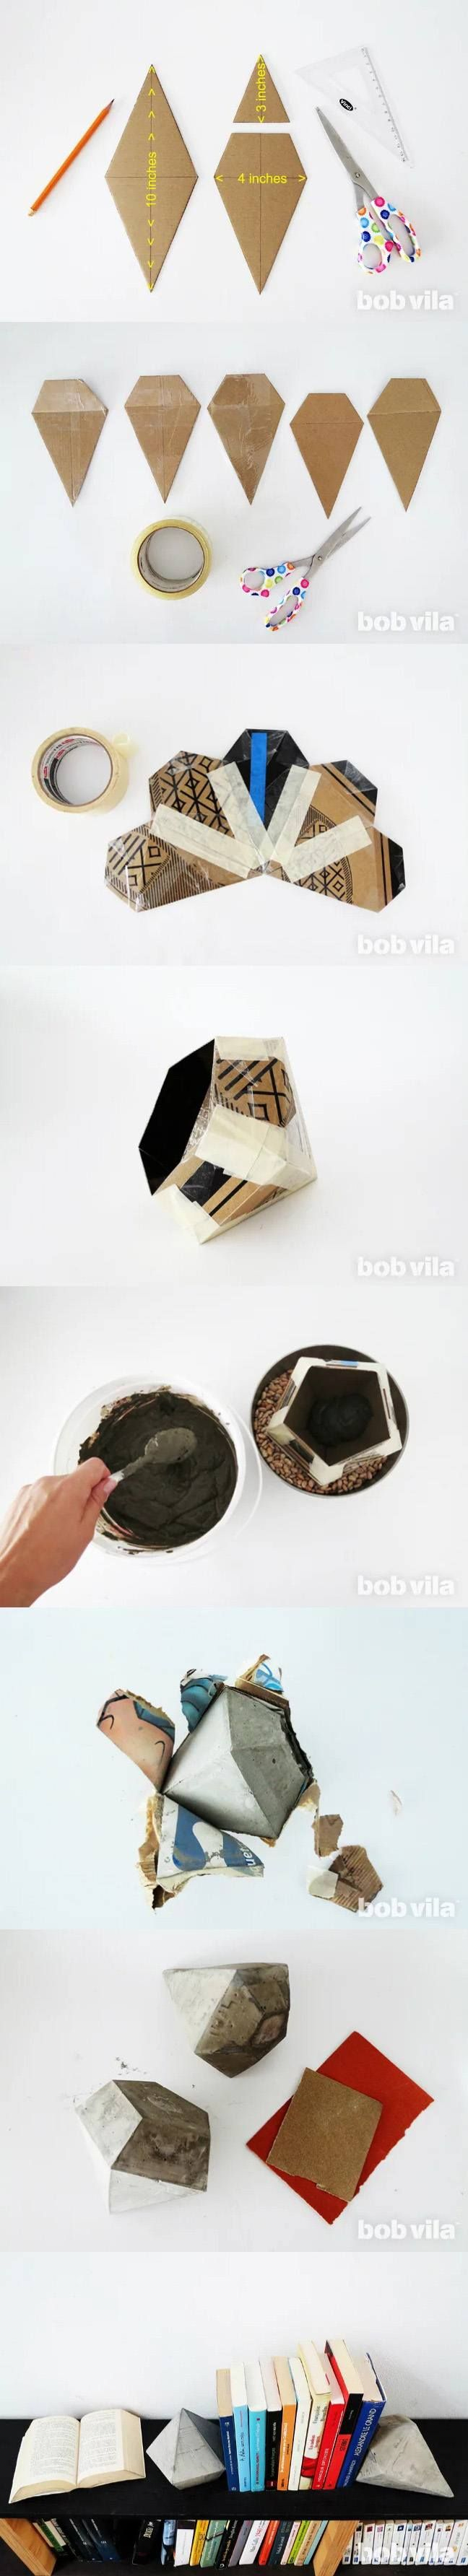 Sujetalibros hormigón - bobvila.com - DIY Concrete Modern Bookends